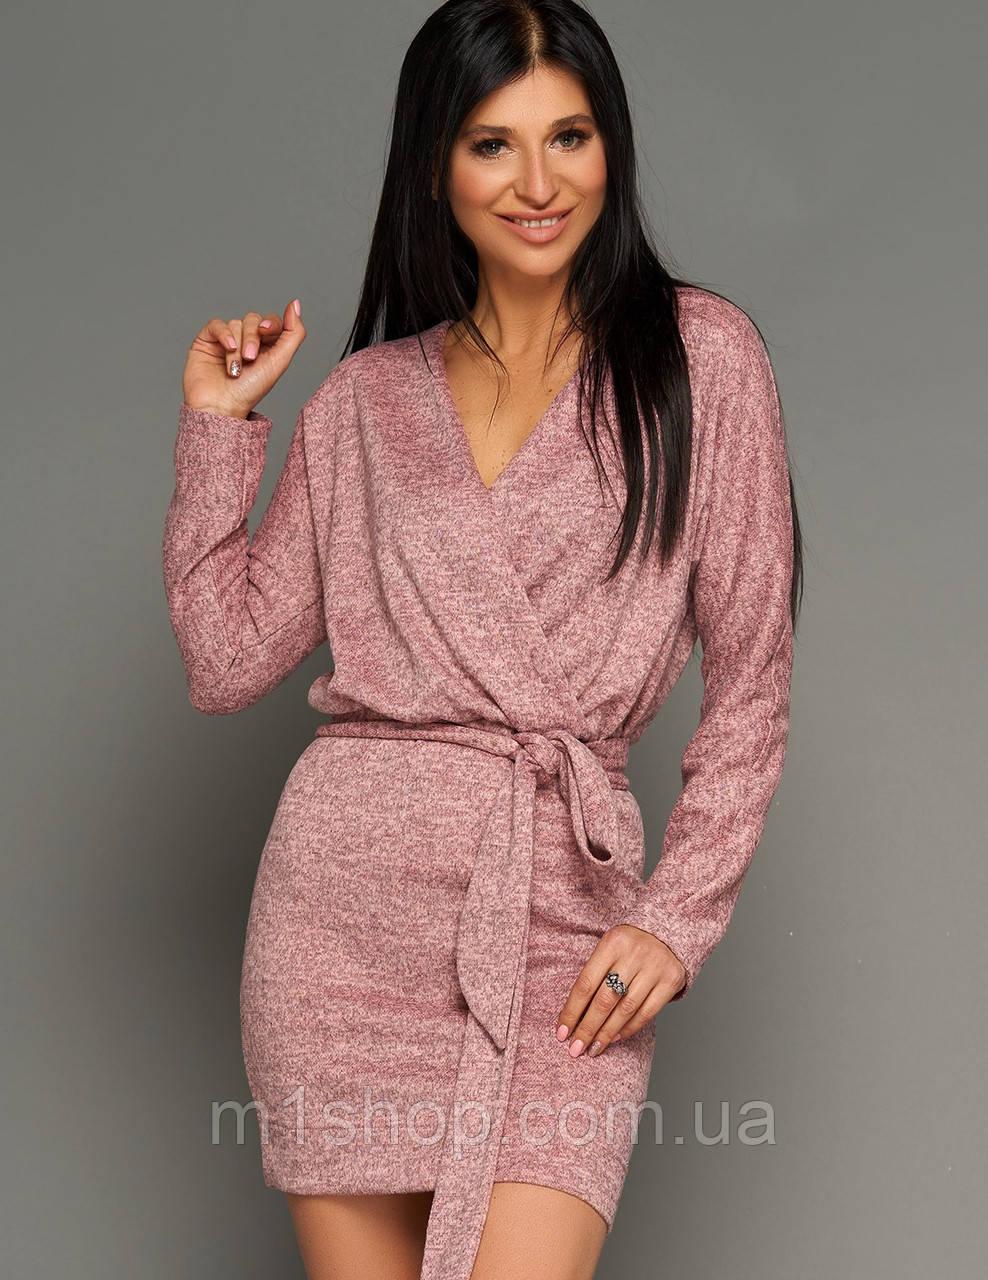 Женское короткое меланжевое платье из ангоры (Эльзаjd)